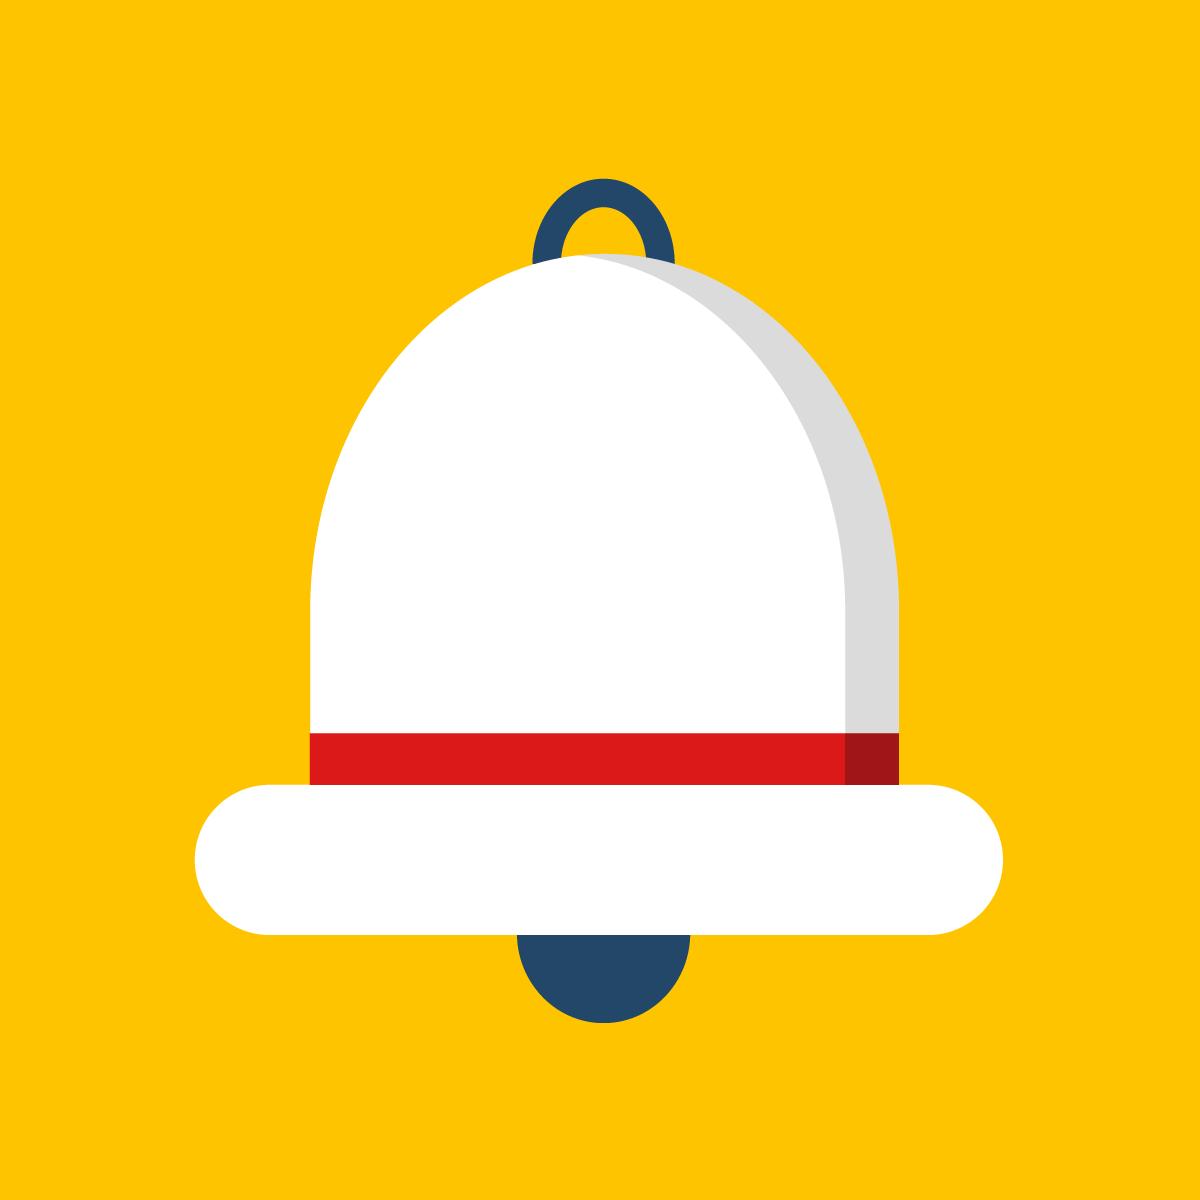 Shopify Web Push Notifications app by Pushdaddy.com